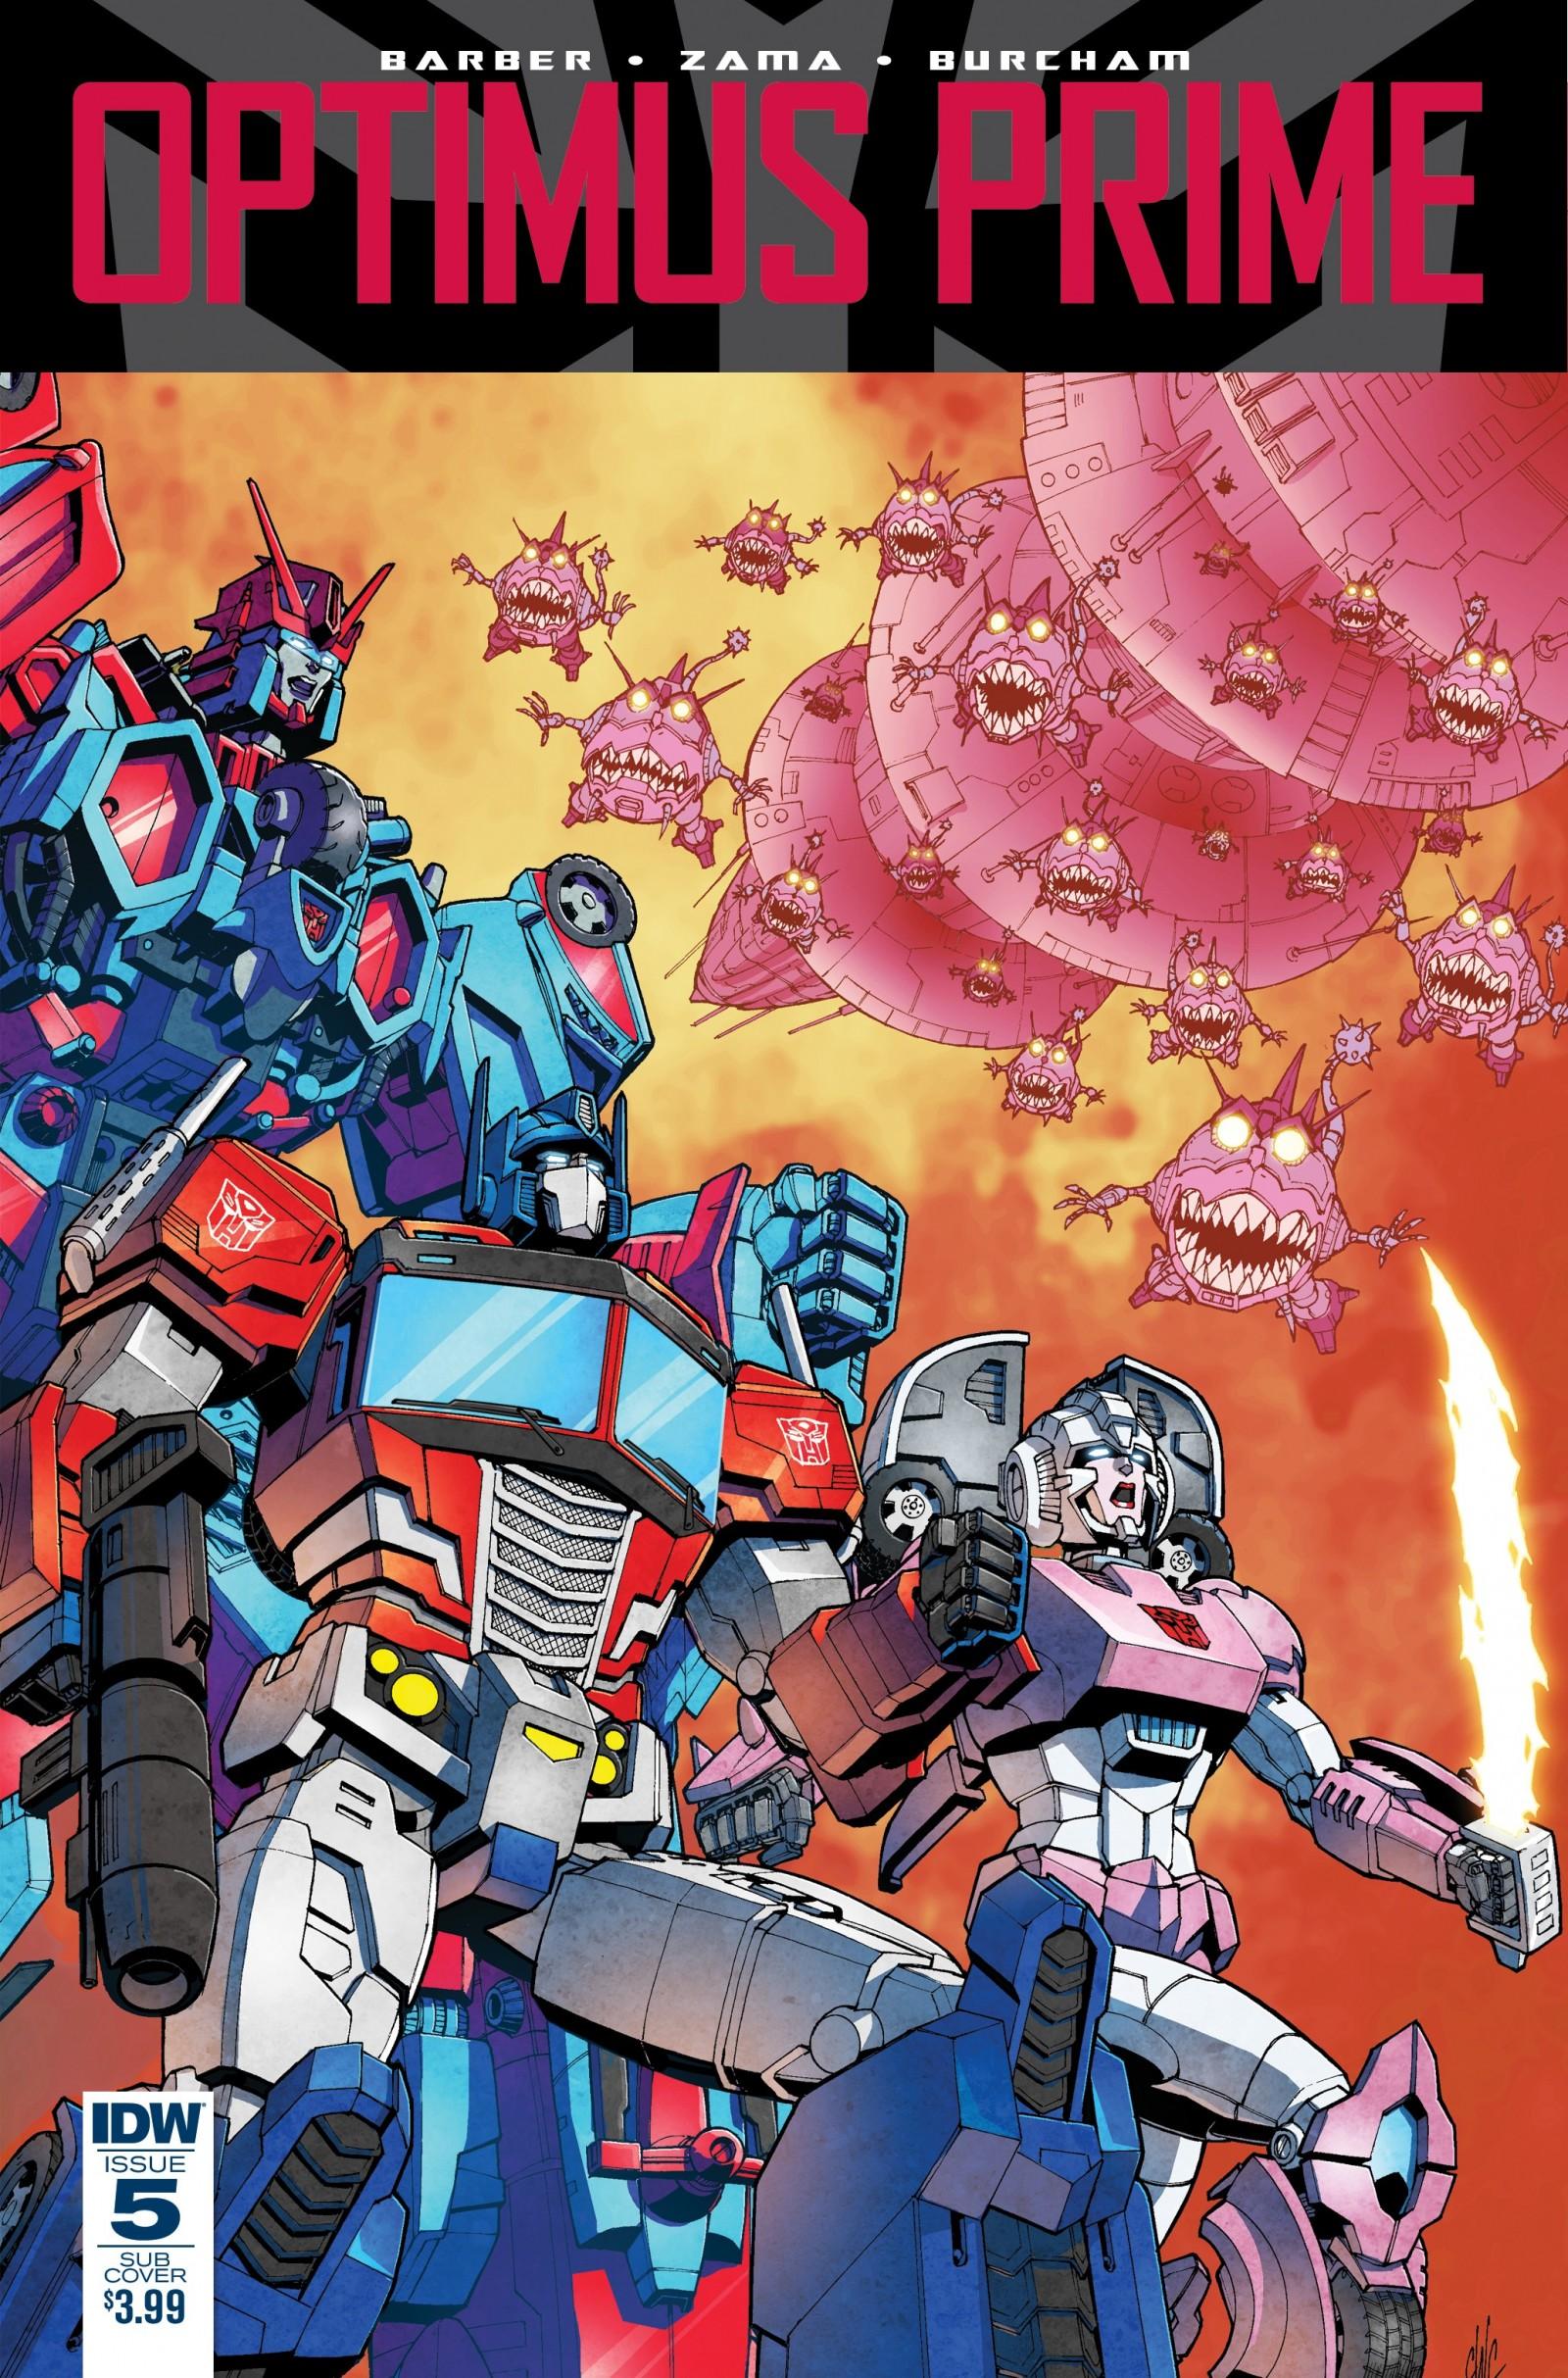 Idw Transformers Comics For March 2017 Revolutionaries